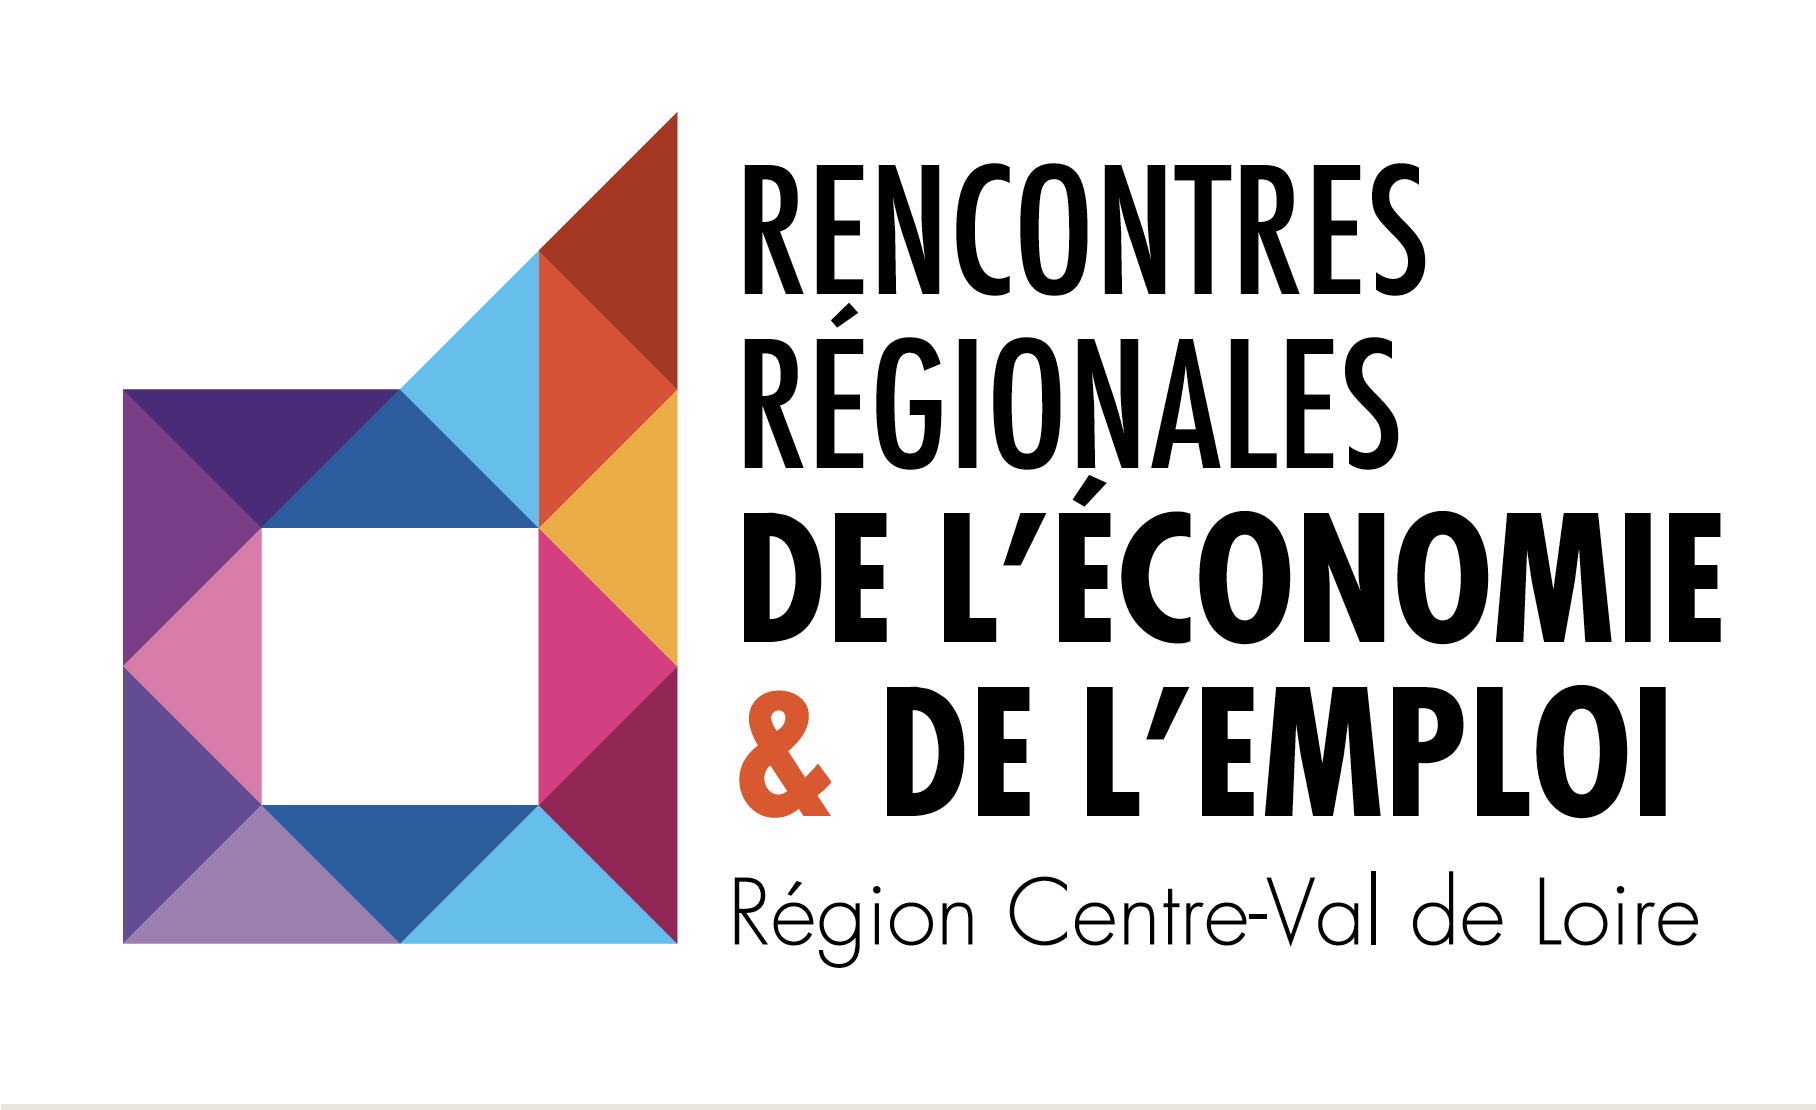 Rencontres regionales de l innovation 2018